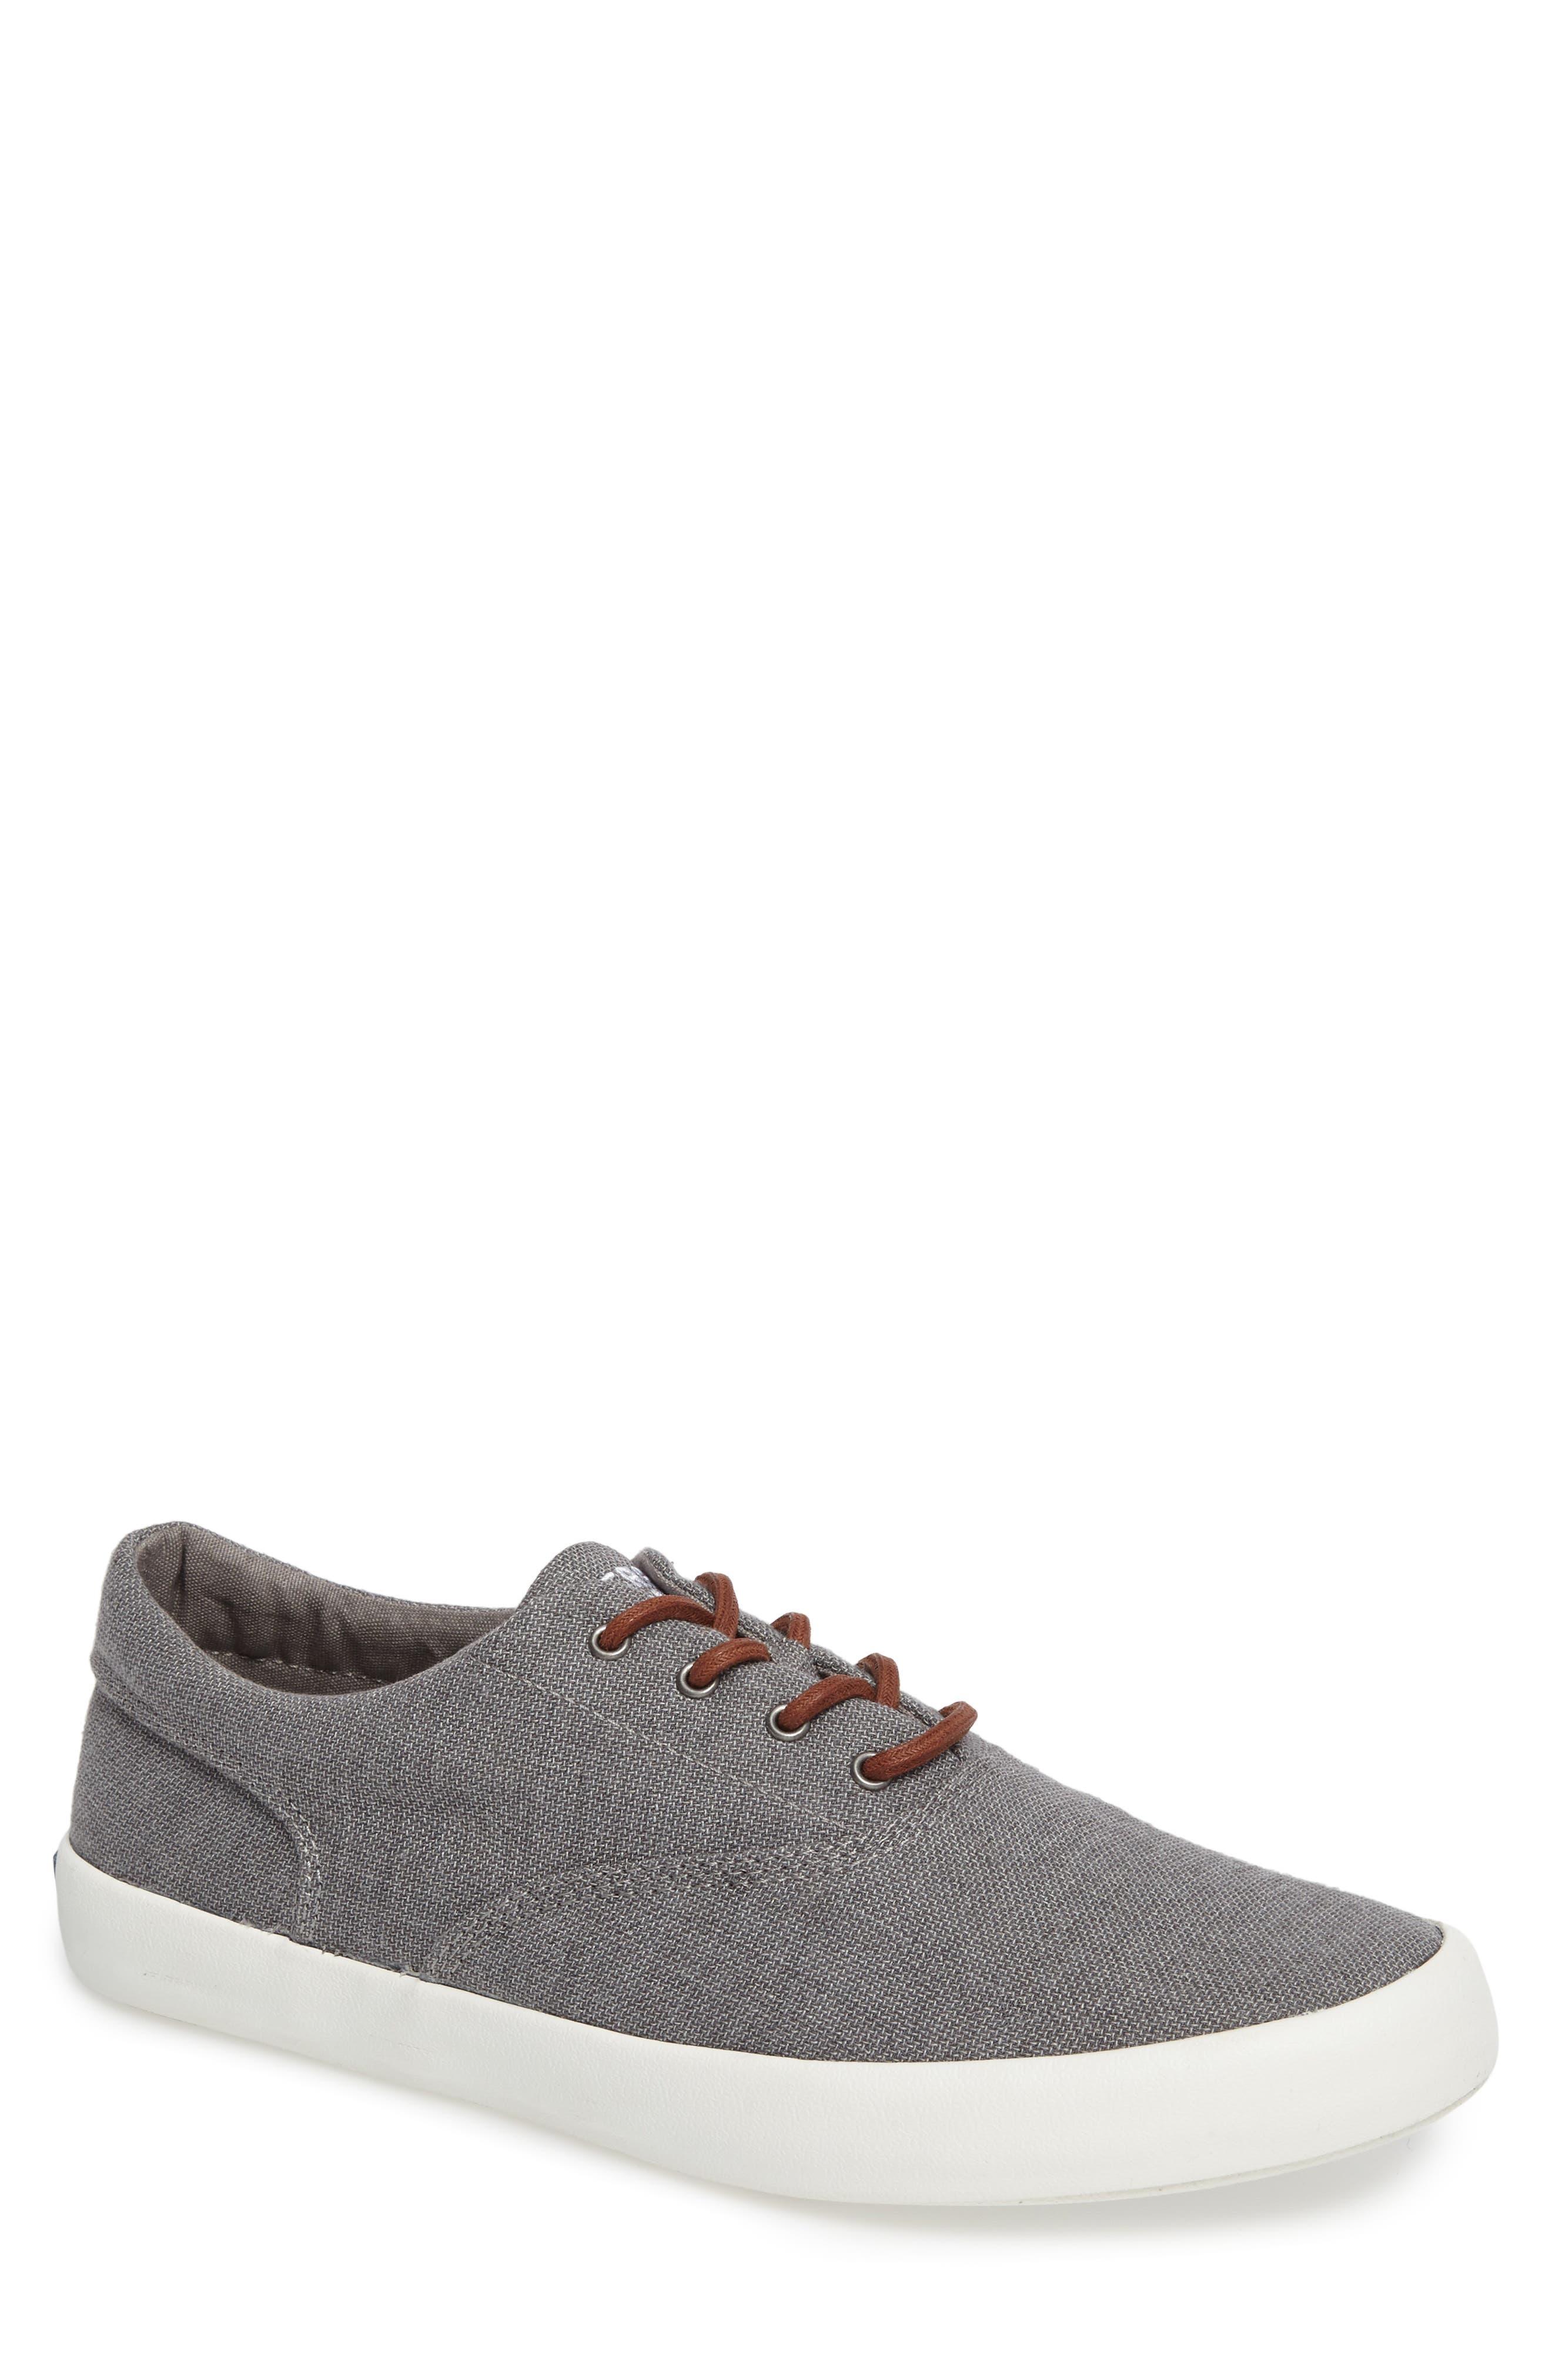 Wahoo Sneaker,                         Main,                         color, 020